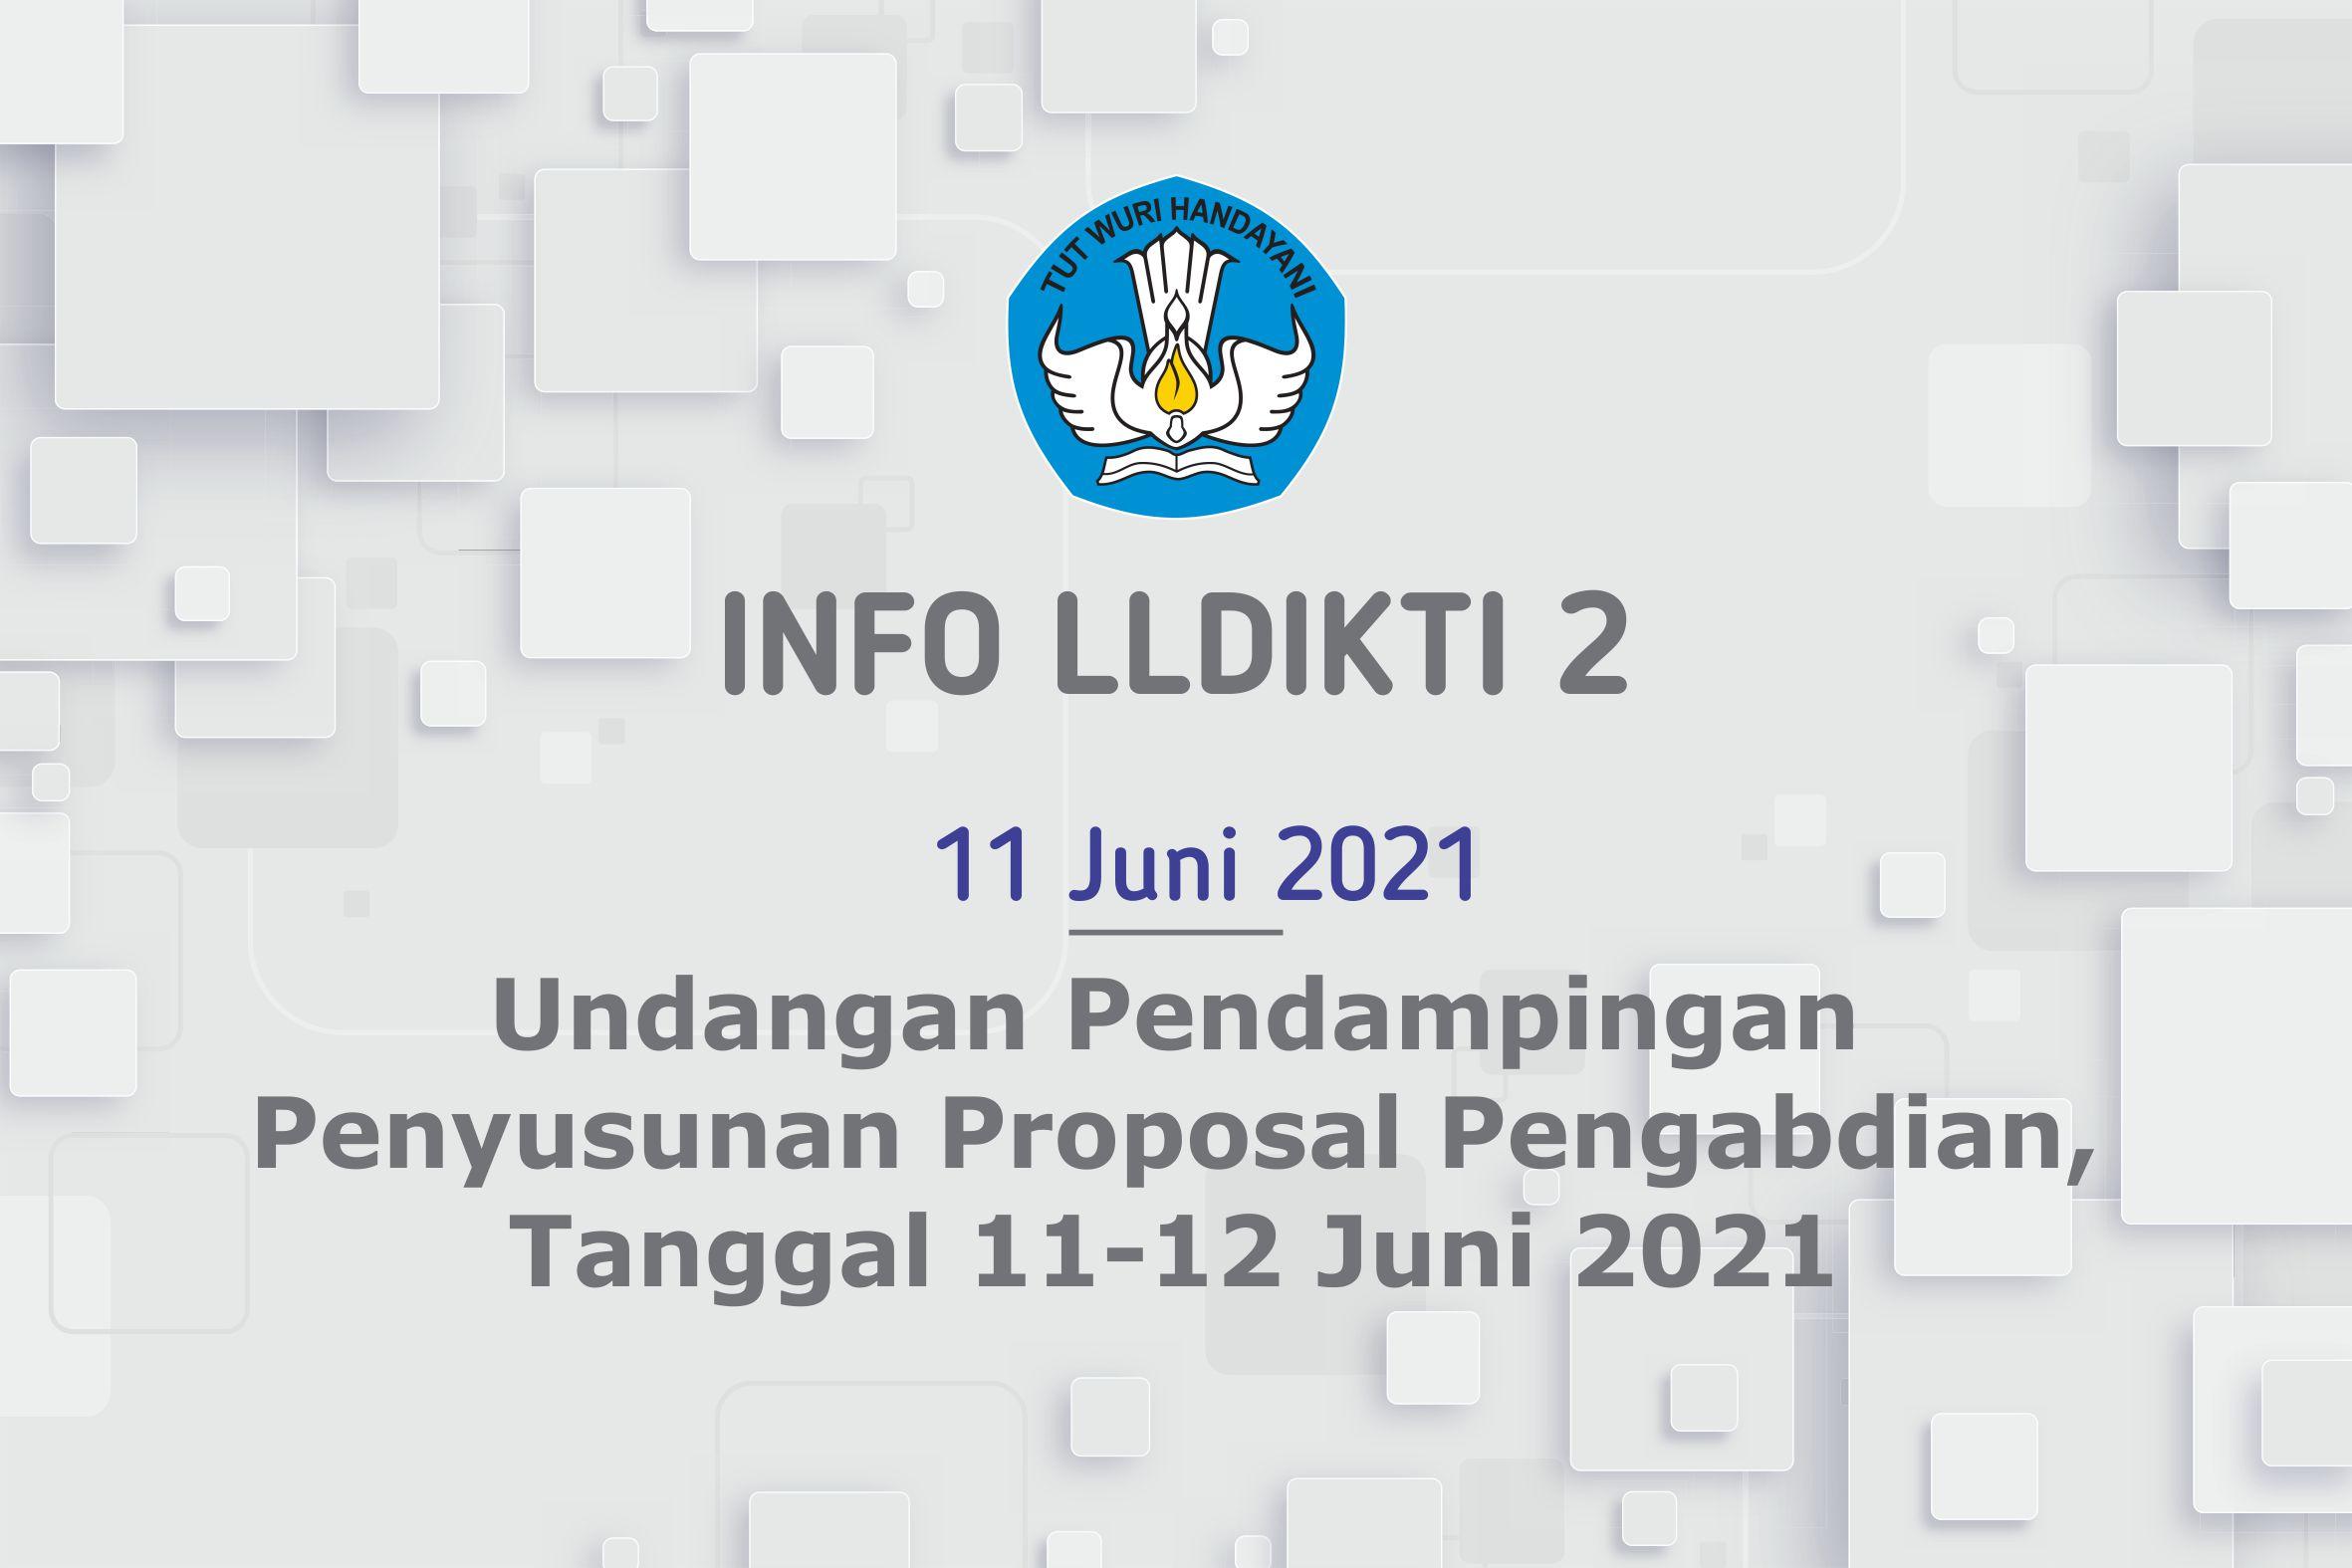 Undangan Pendampingan Penyusunan Proposal Pengabdian Tanggal 11-12 Juni 2021